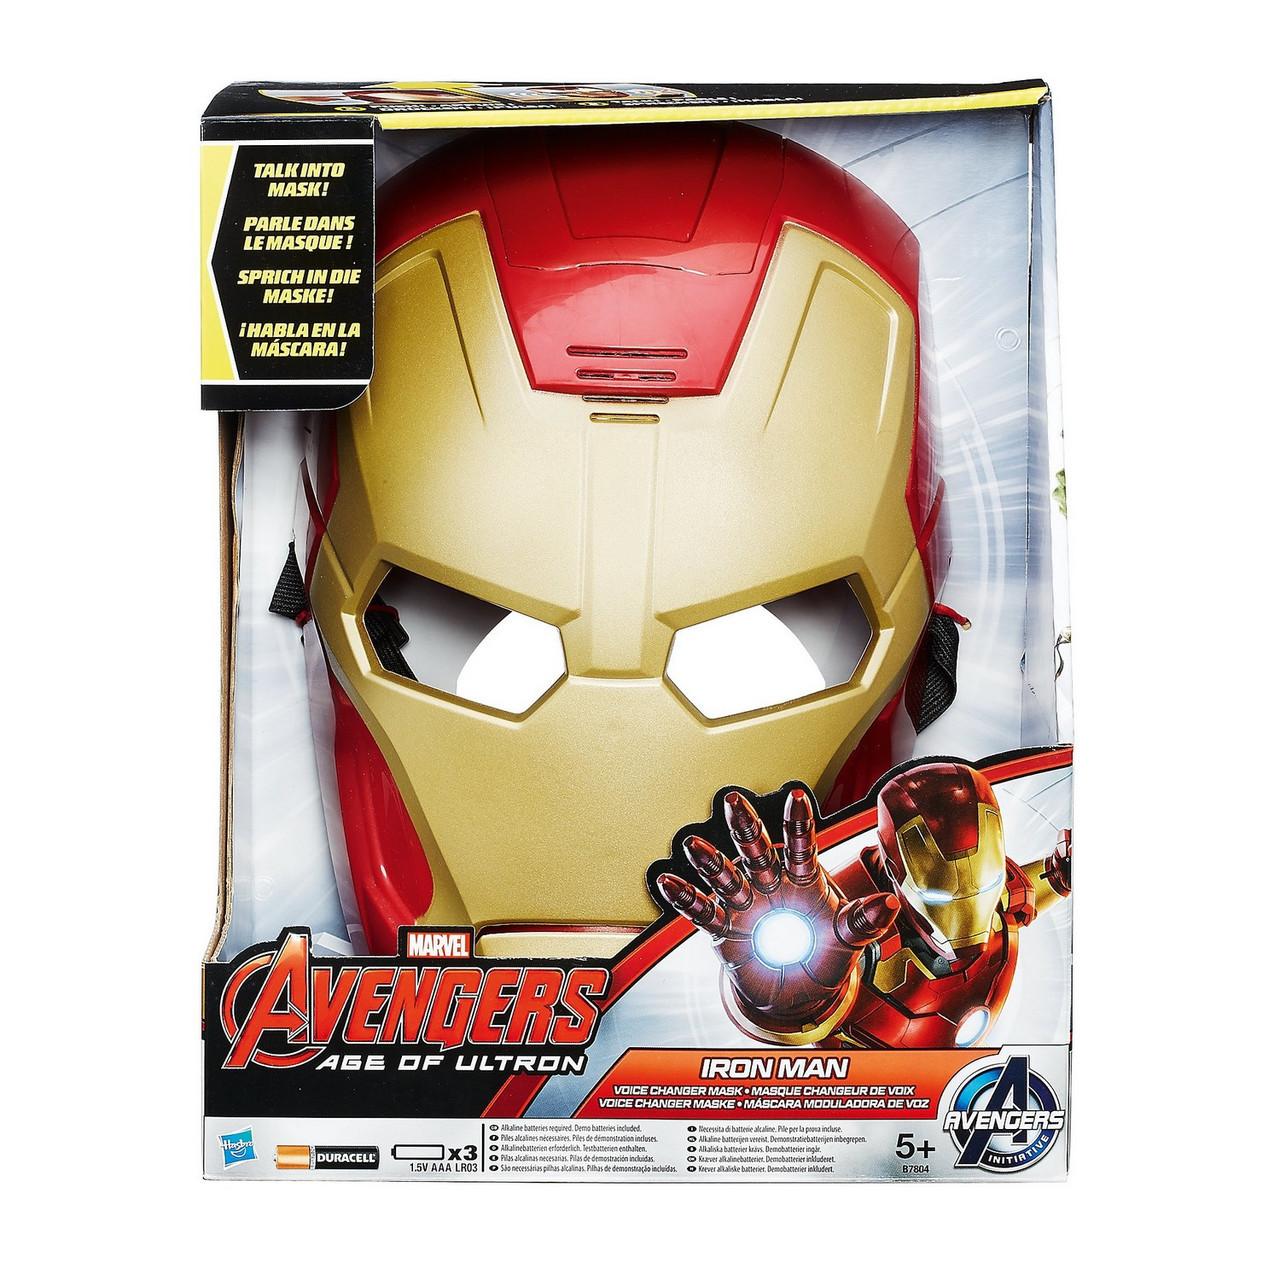 Маска Железного Человека меняющая голос - Voice Changer Mask Iron Man, Age of Ultron, Avengers, Hasbro